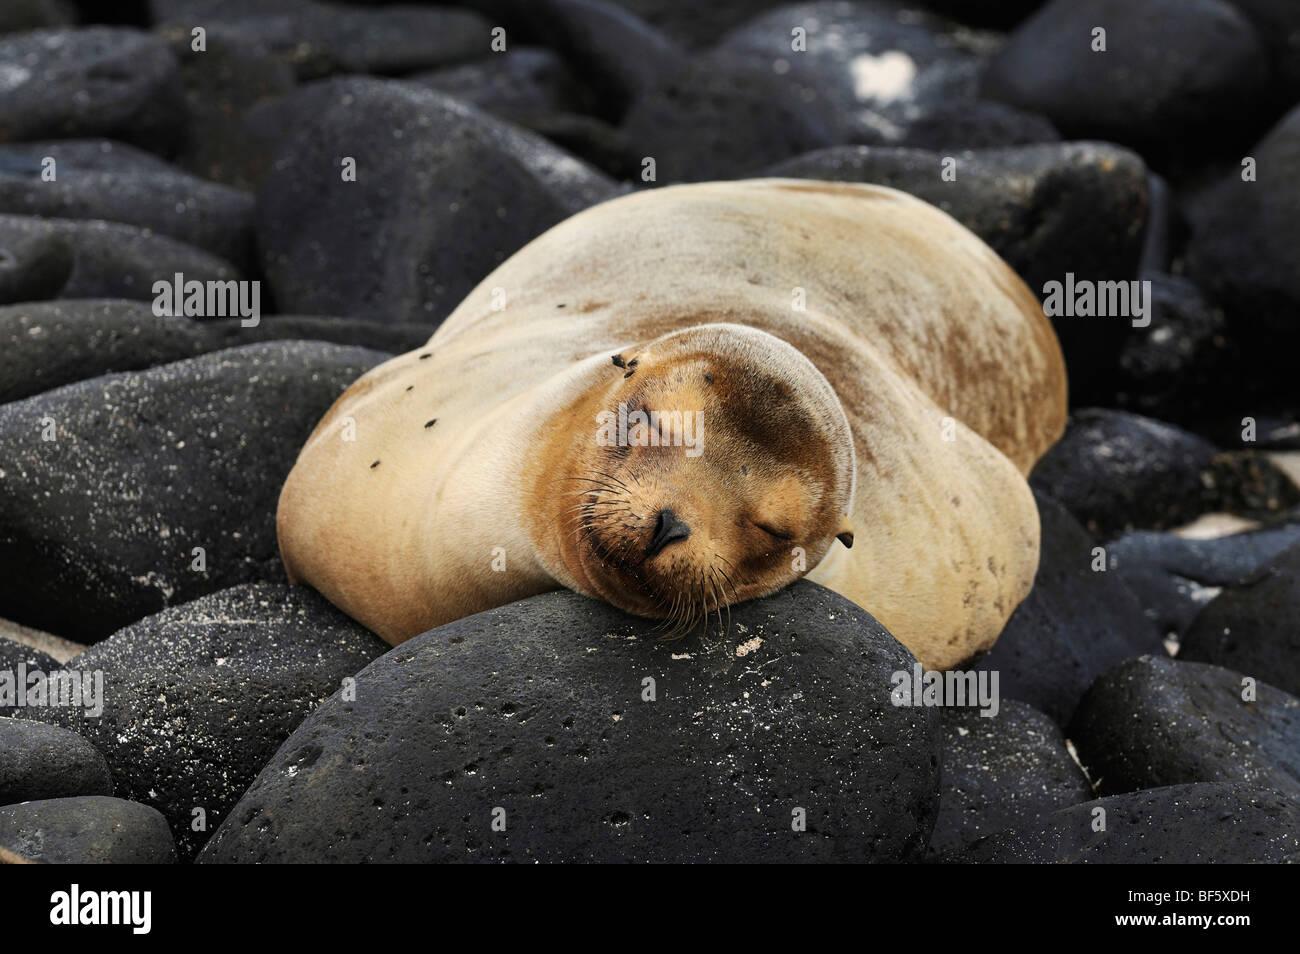 Lobo de mar de Galápagos (Zalophus wollebaeki), adulto en playa, Espanola Isla Galápagos, Ecuador, Sudamérica Imagen De Stock